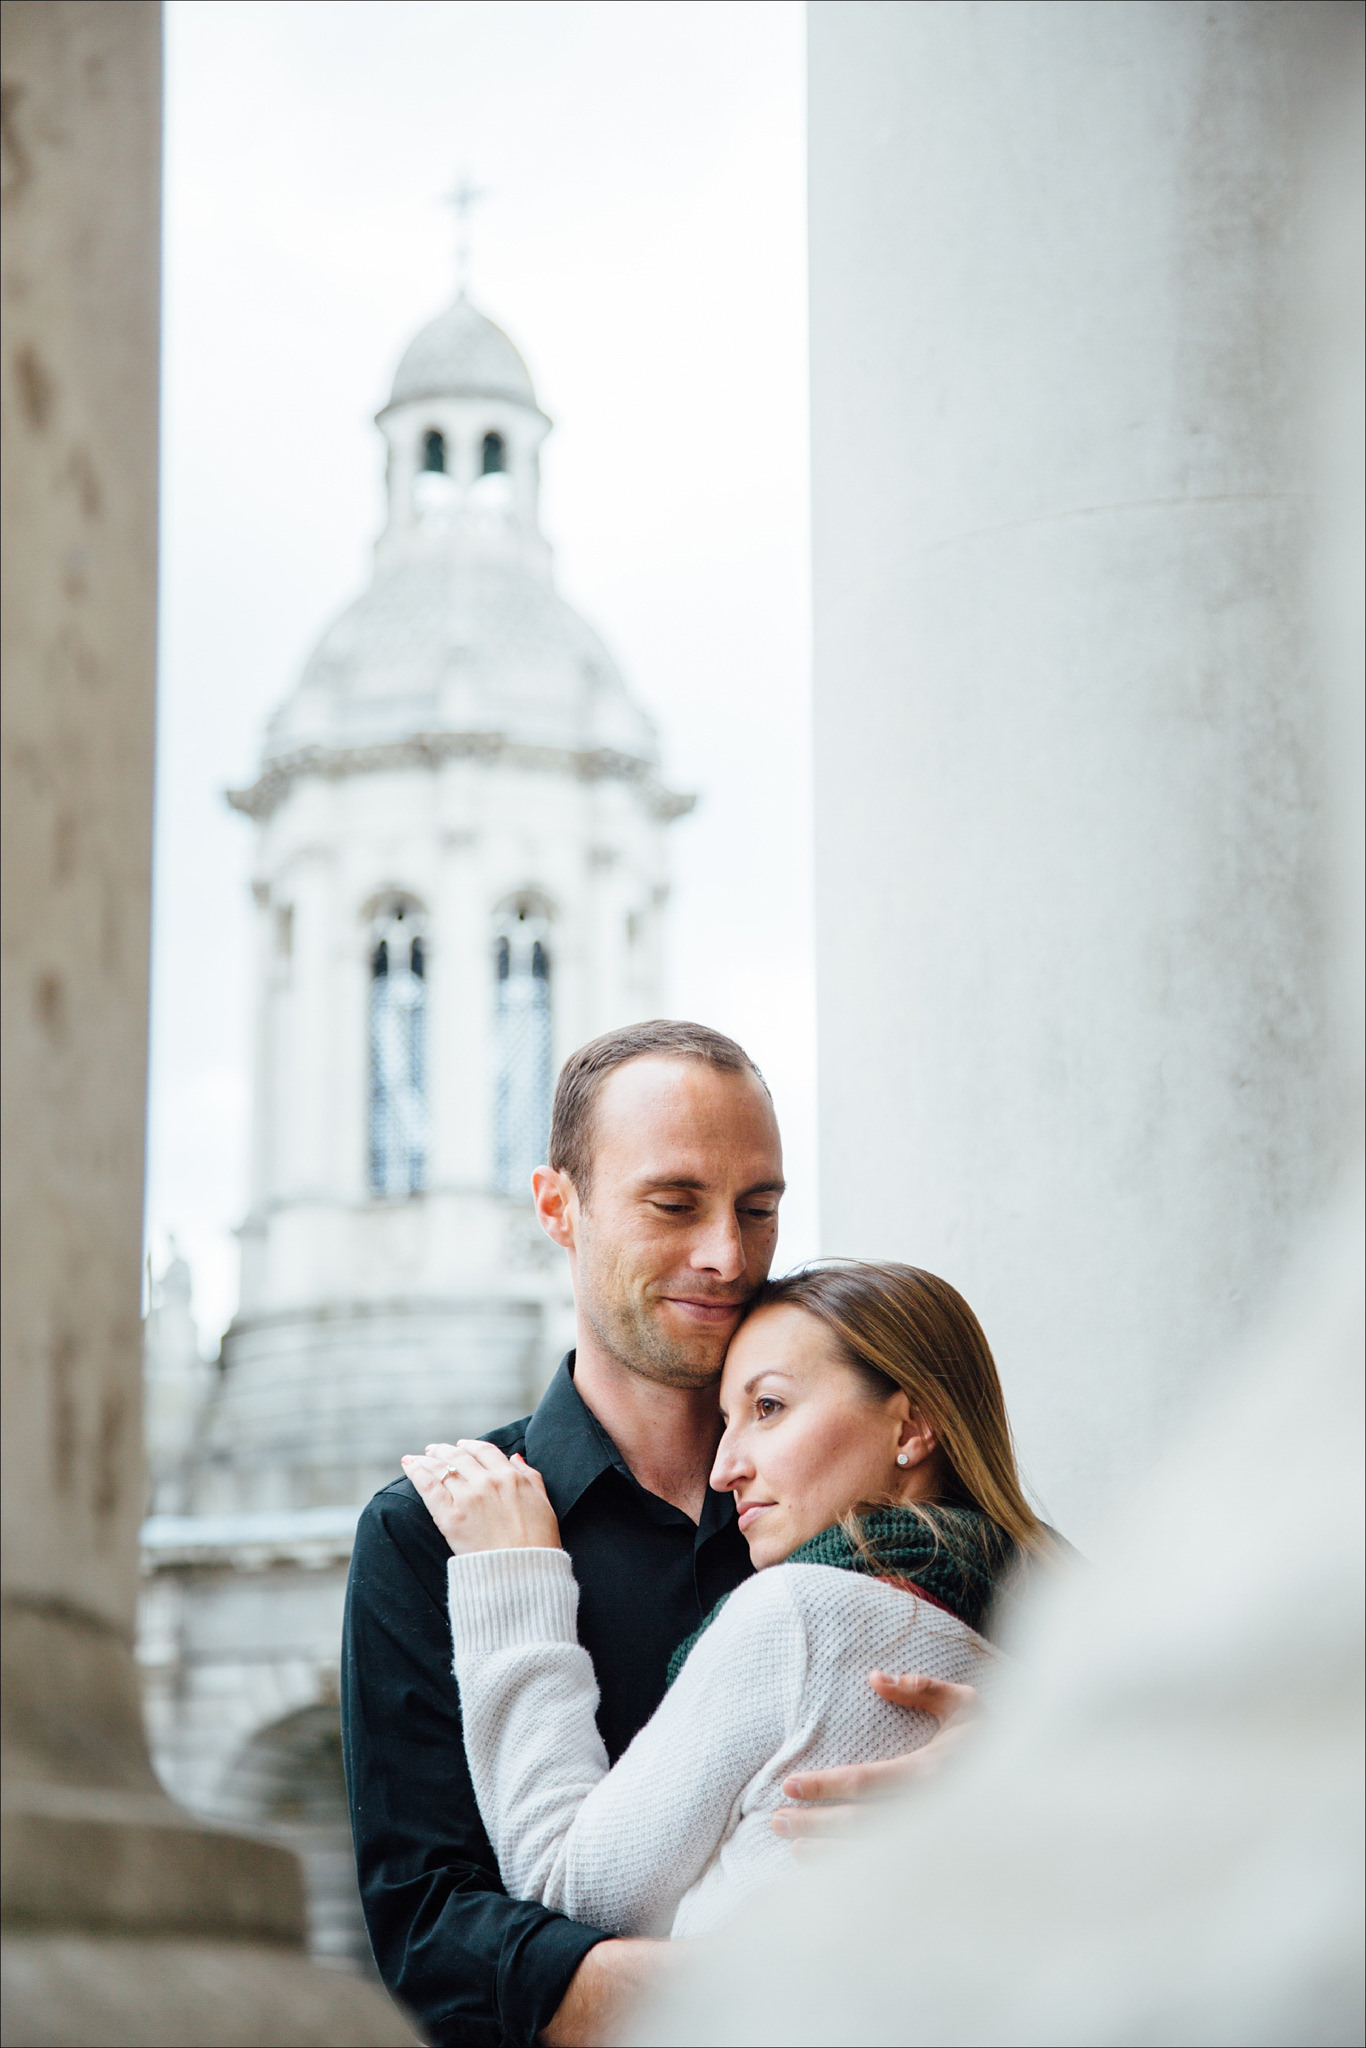 dublin wedding photographer david duignan photography engagement couple city photo shoot  ireland 0012